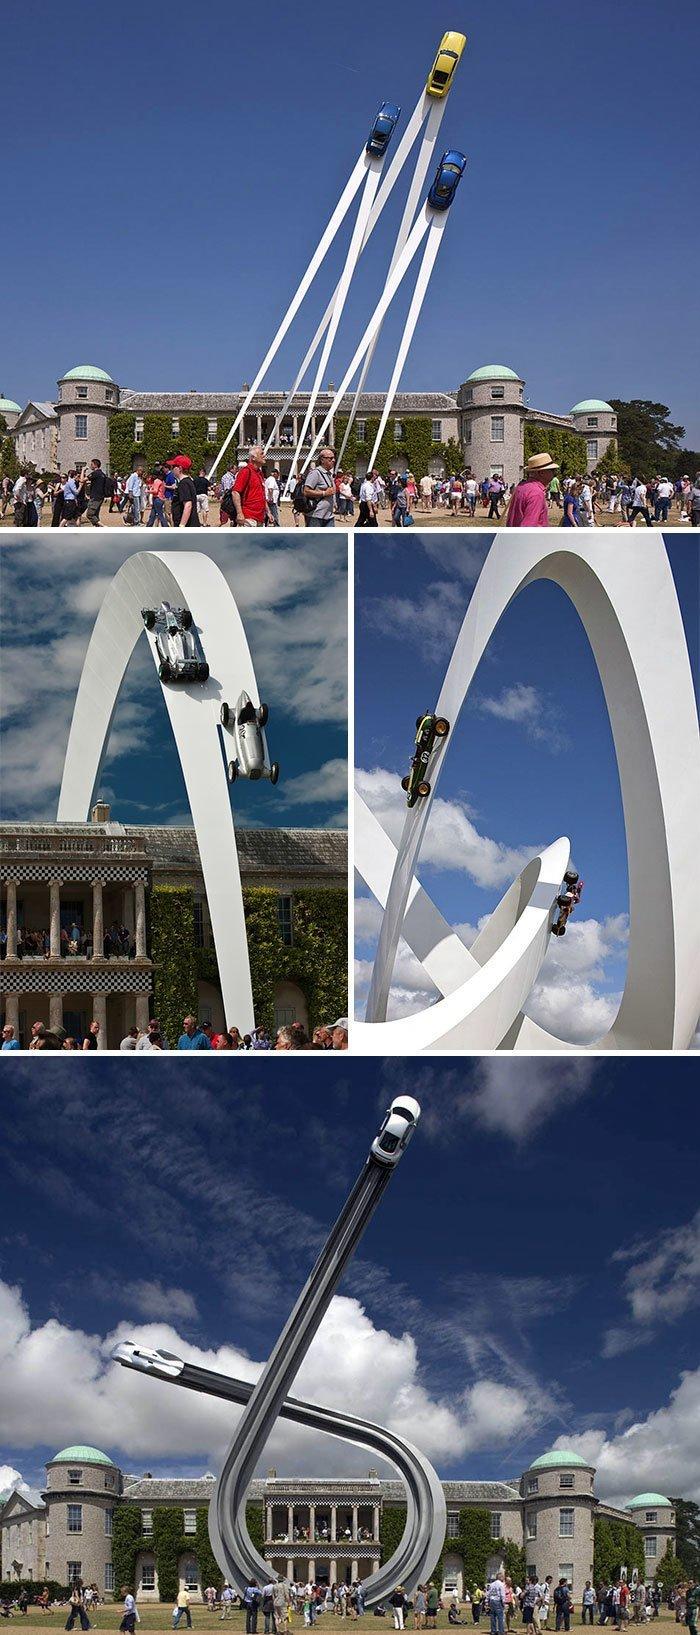 Sculptures by Jerry Judah